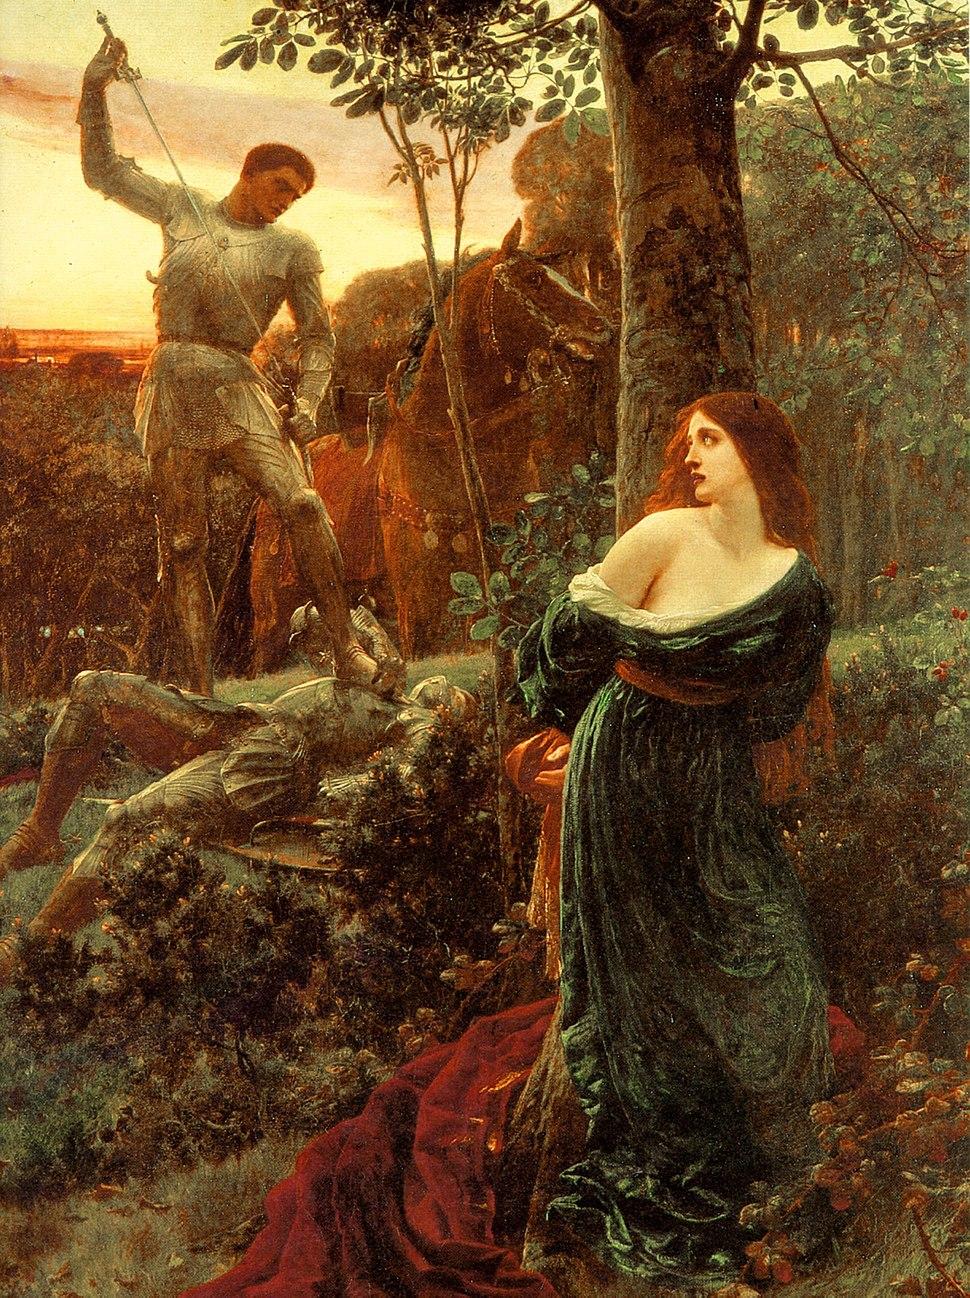 Dicksee-Chivalry-1885